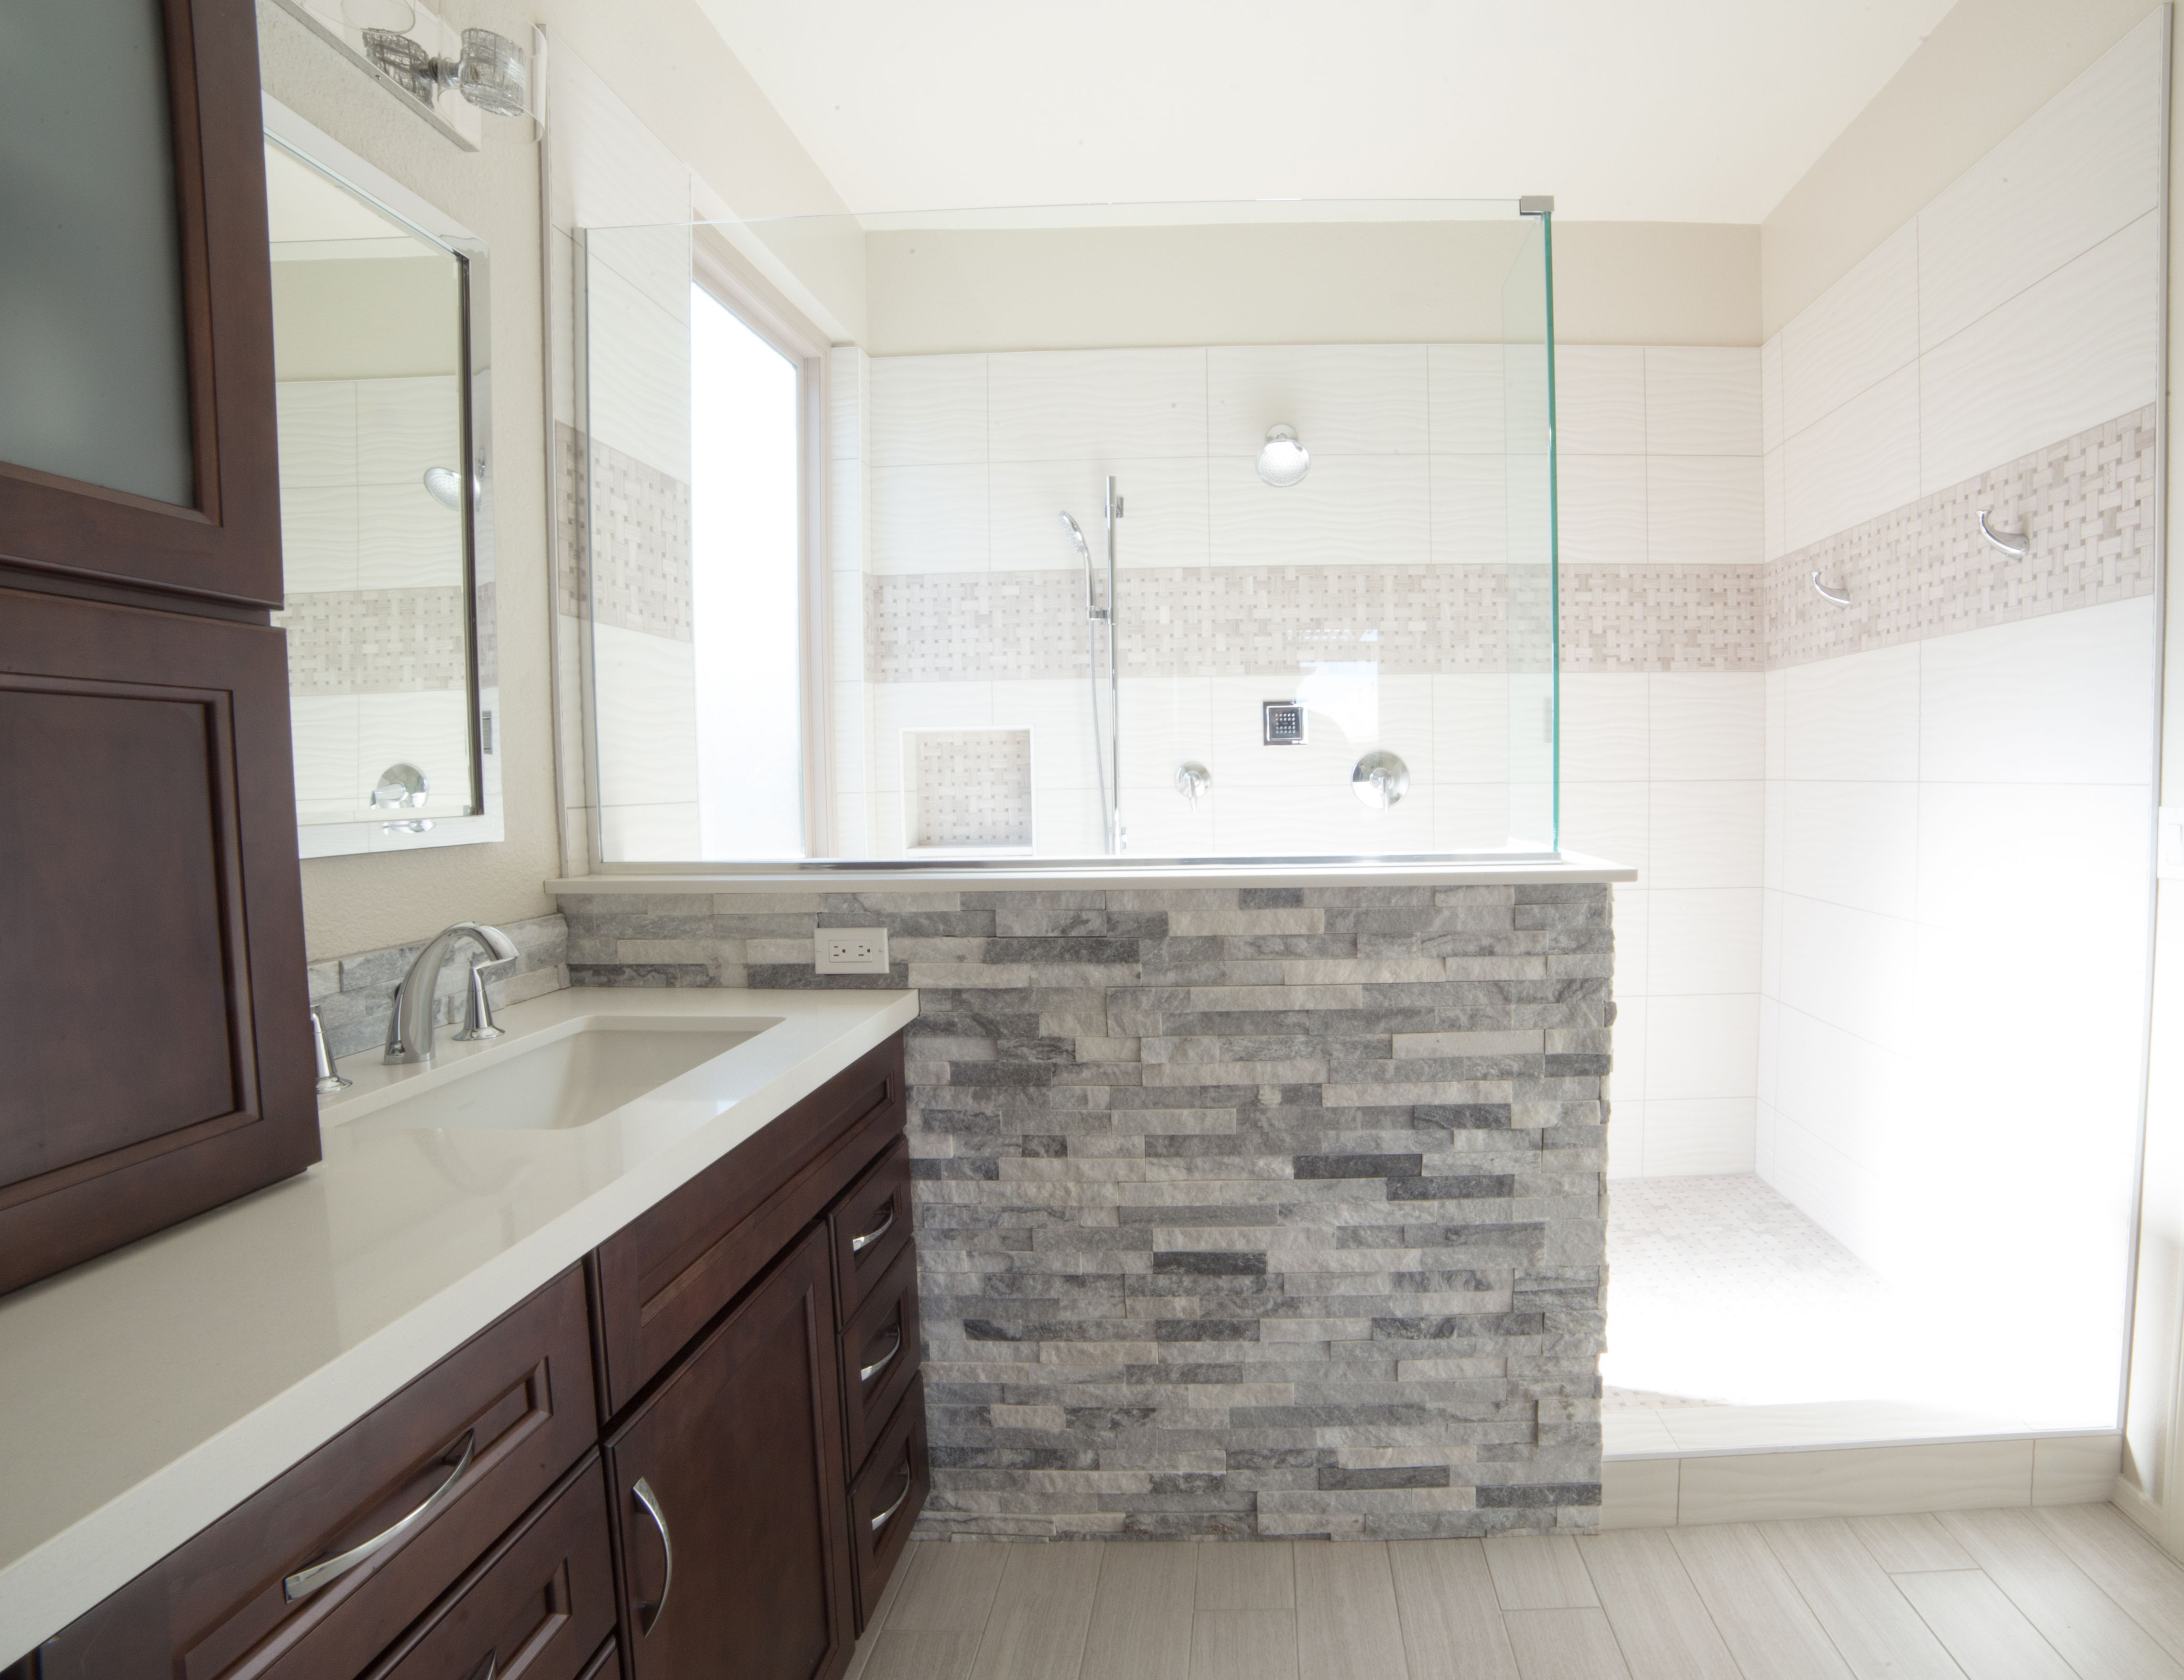 Bathroom Remodel Cabinets Phoenix Az Bathrooms Remodel Cabinet Remodel Bathroom Remodel Master